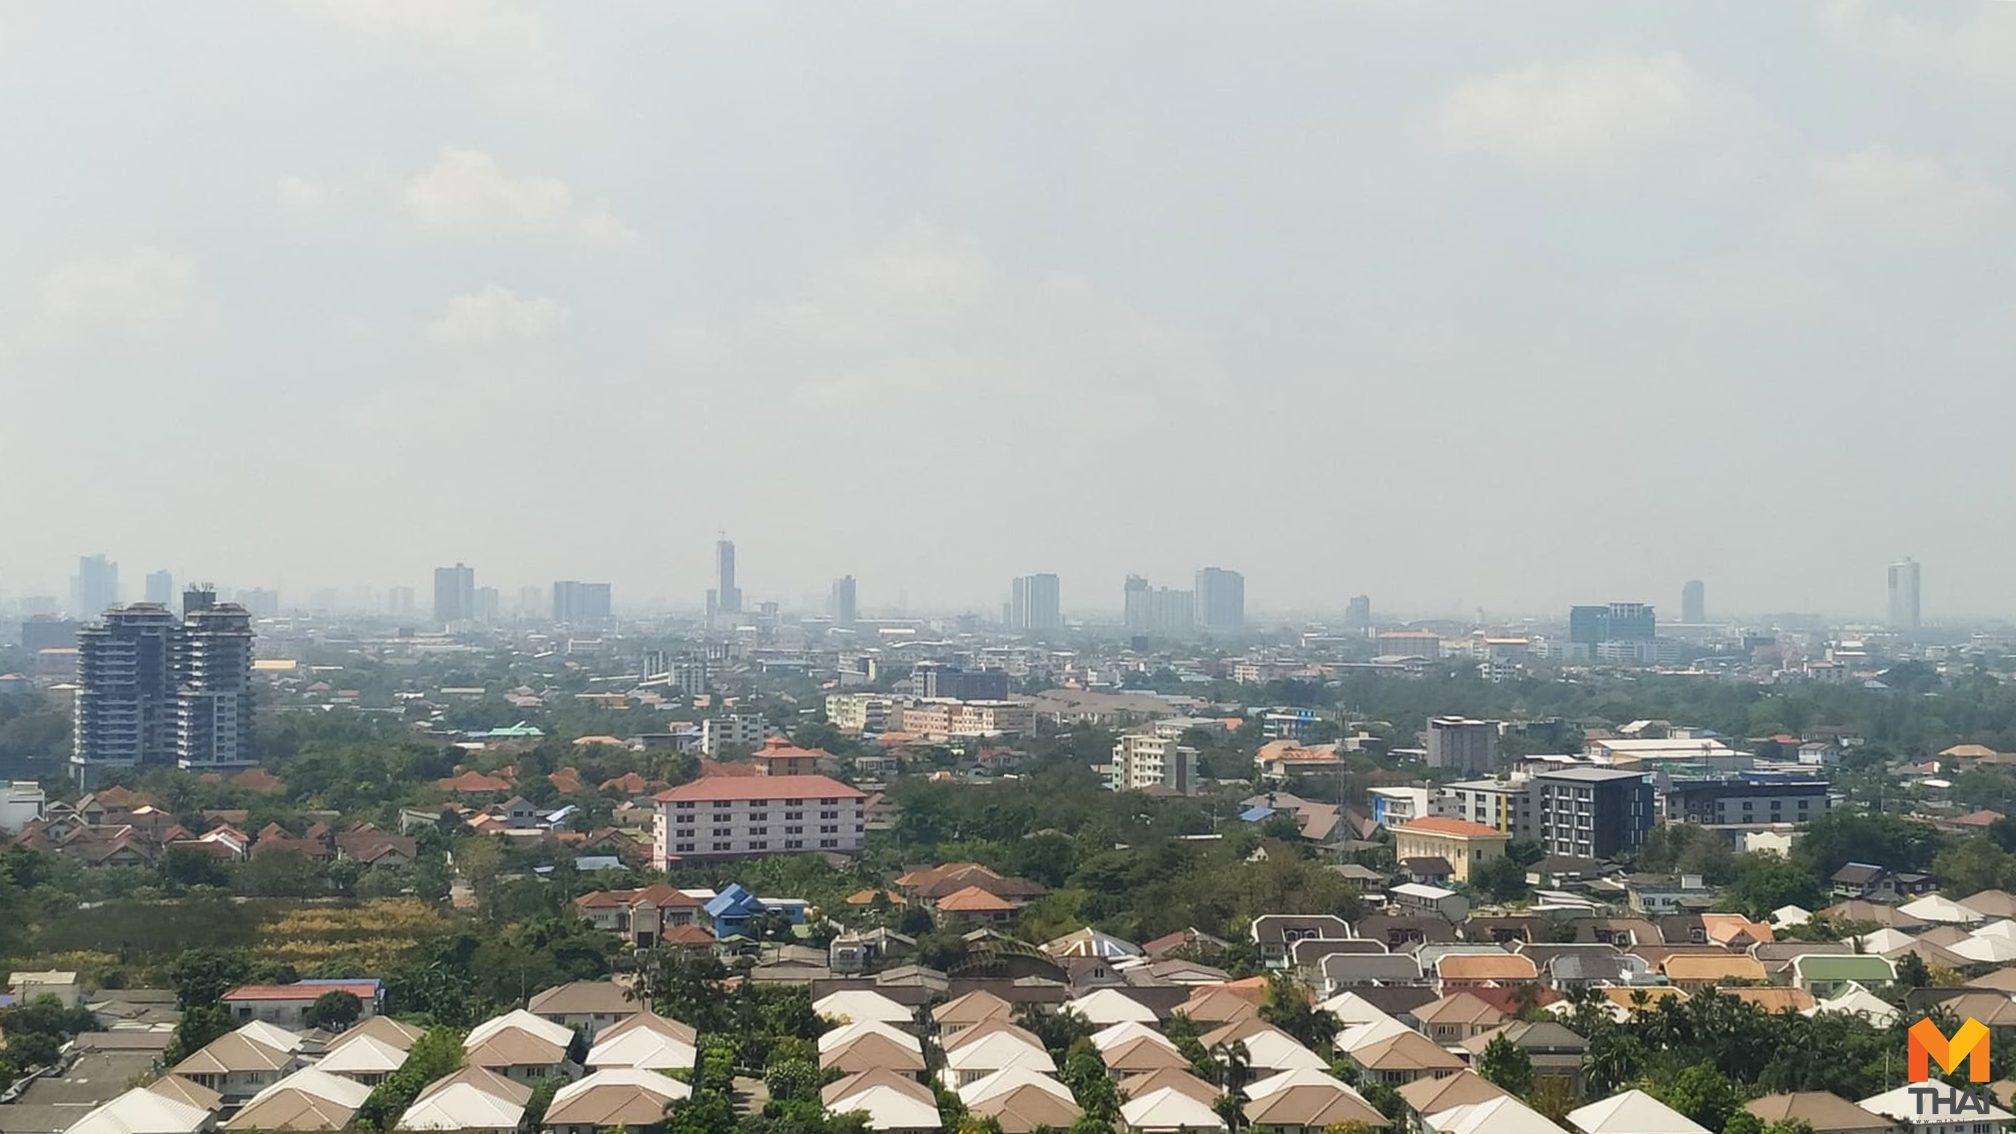 PM 2.5 เกินมาตรฐาน 9 จุด เหตุลมมีกำลังอ่อนตัวฝุ่นสะสม